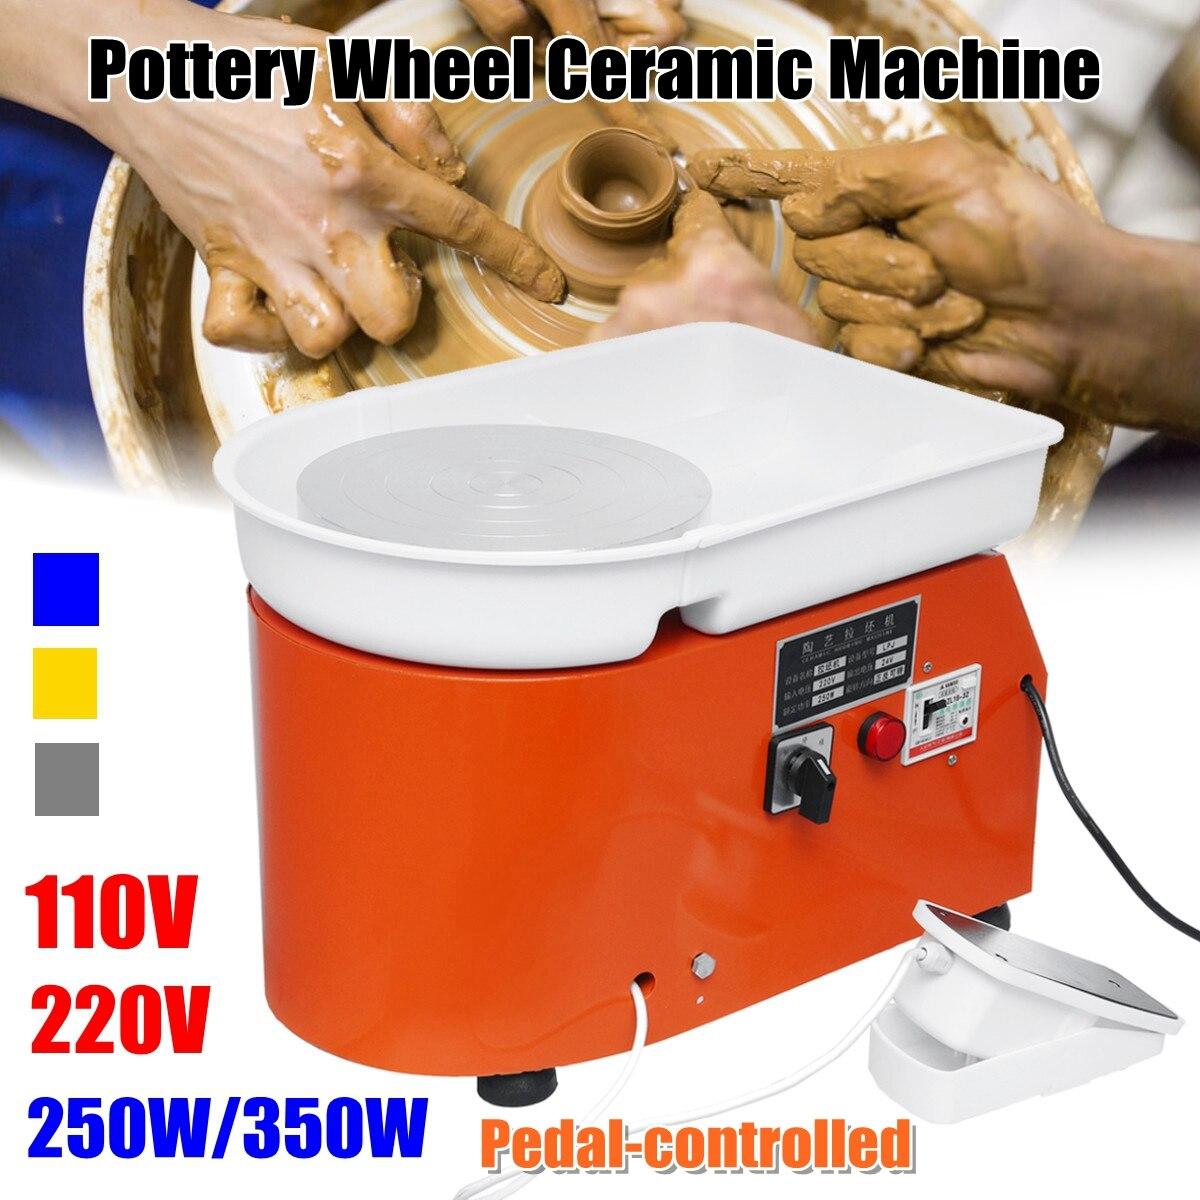 110V/220V 350W/250W Electric Tours Wheel Pottery Machine Clay Potter Art For Ceramic Work Ceramicsas 25cm 350w pottery wheel pottery diy clay machine for ceramic work ceramics clay 220v children learning machine